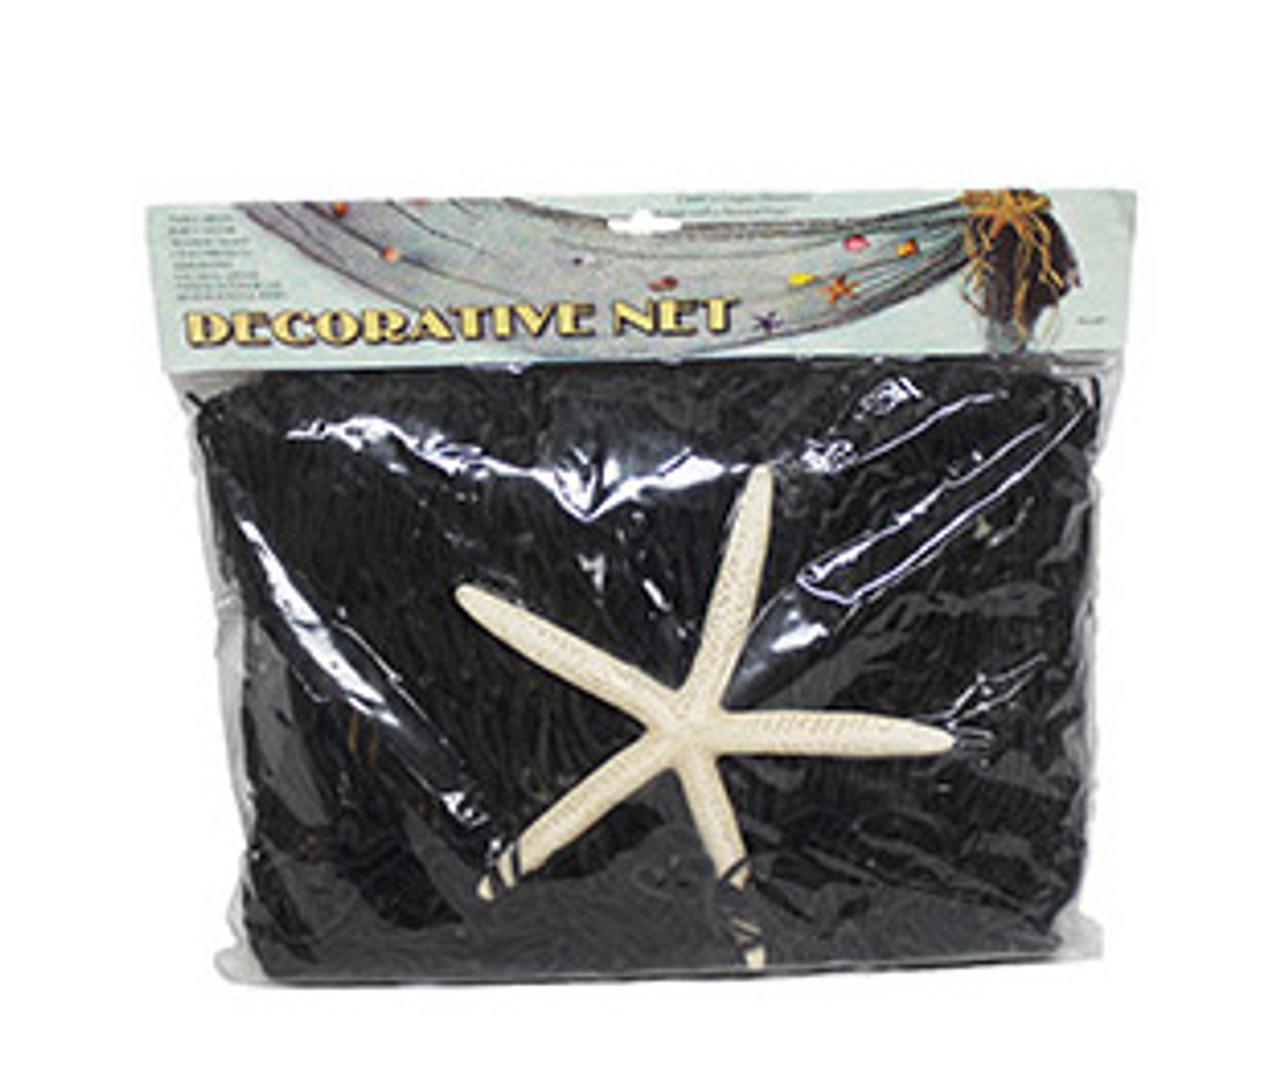 Black Decorative Net 4 x 8 W/Starfish